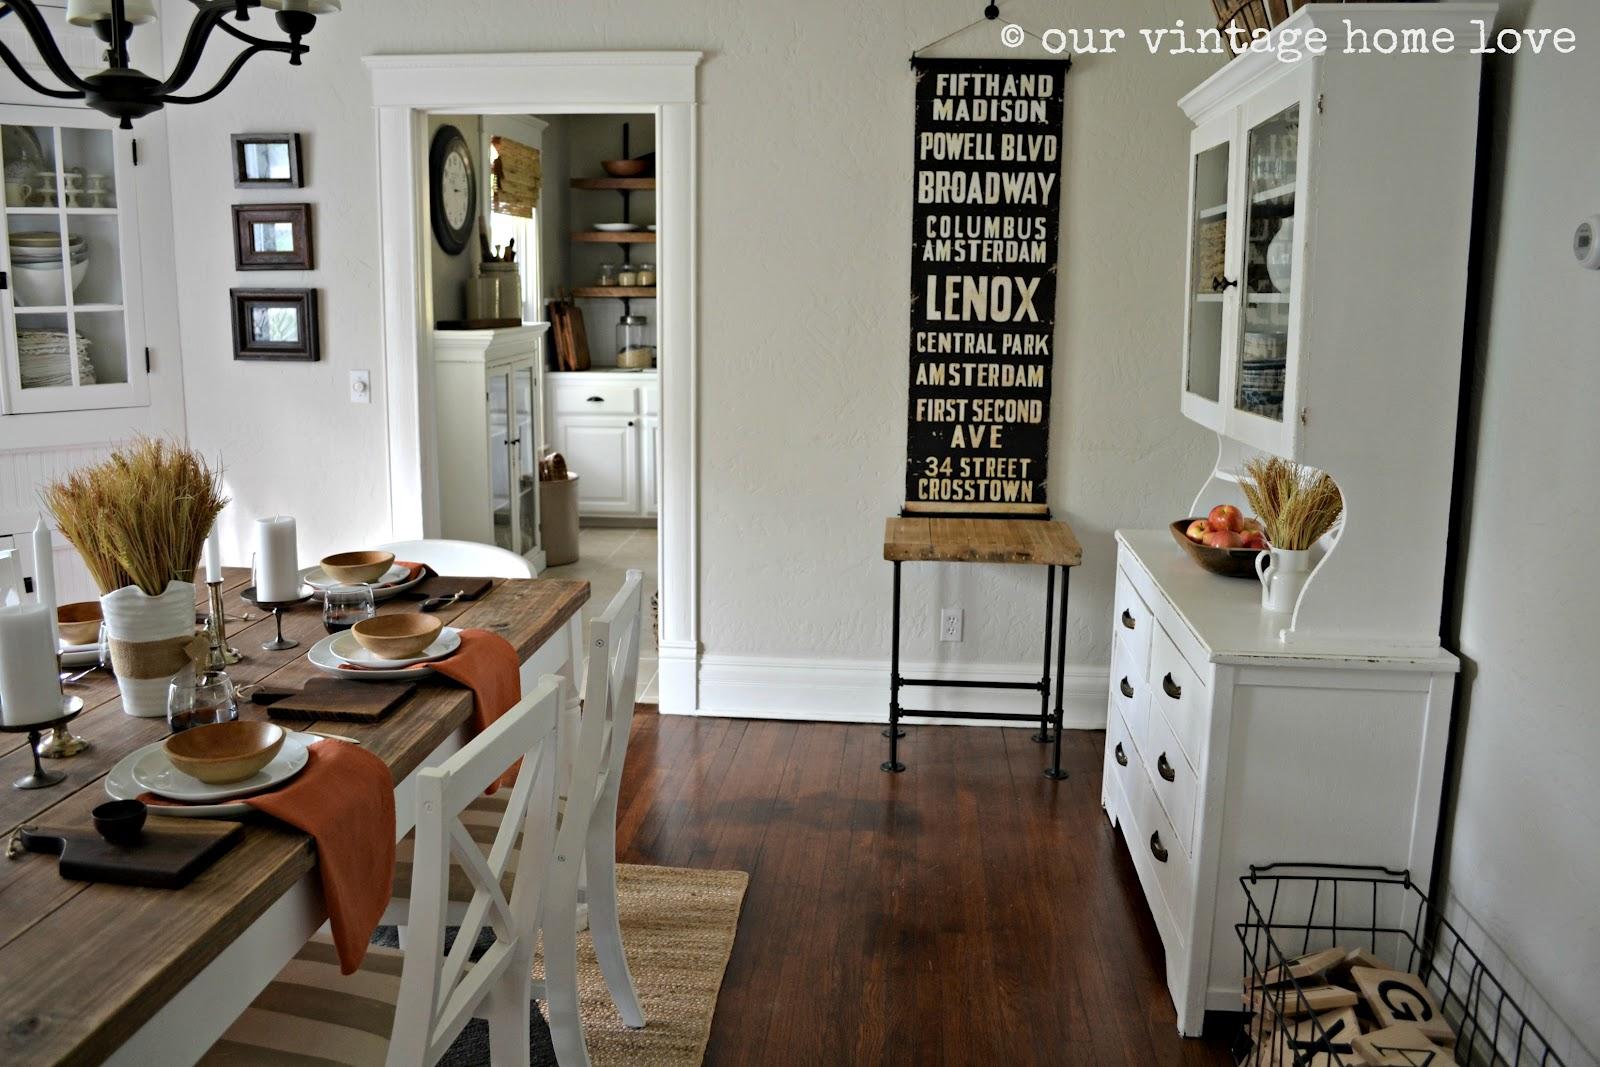 vintage home love Autumn Table Decor and a Vintage